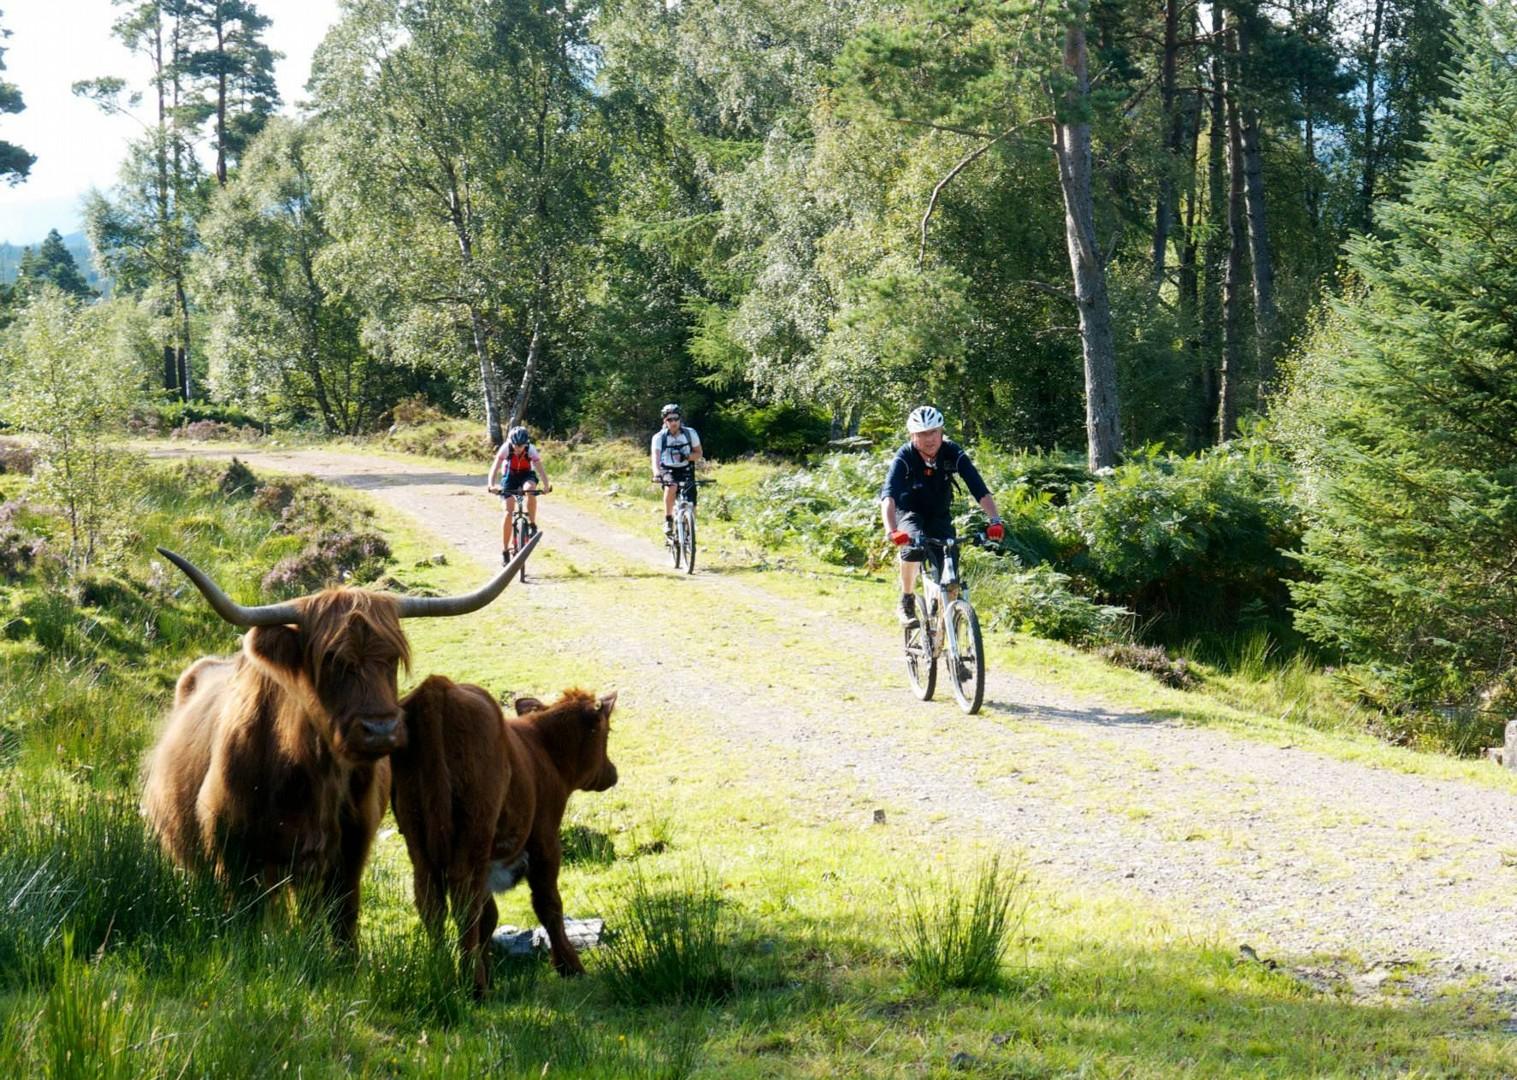 scottish-highlands-guided-mountain-biking.jpg - Scotland - Highlands Coast to Coast - Mountain Biking